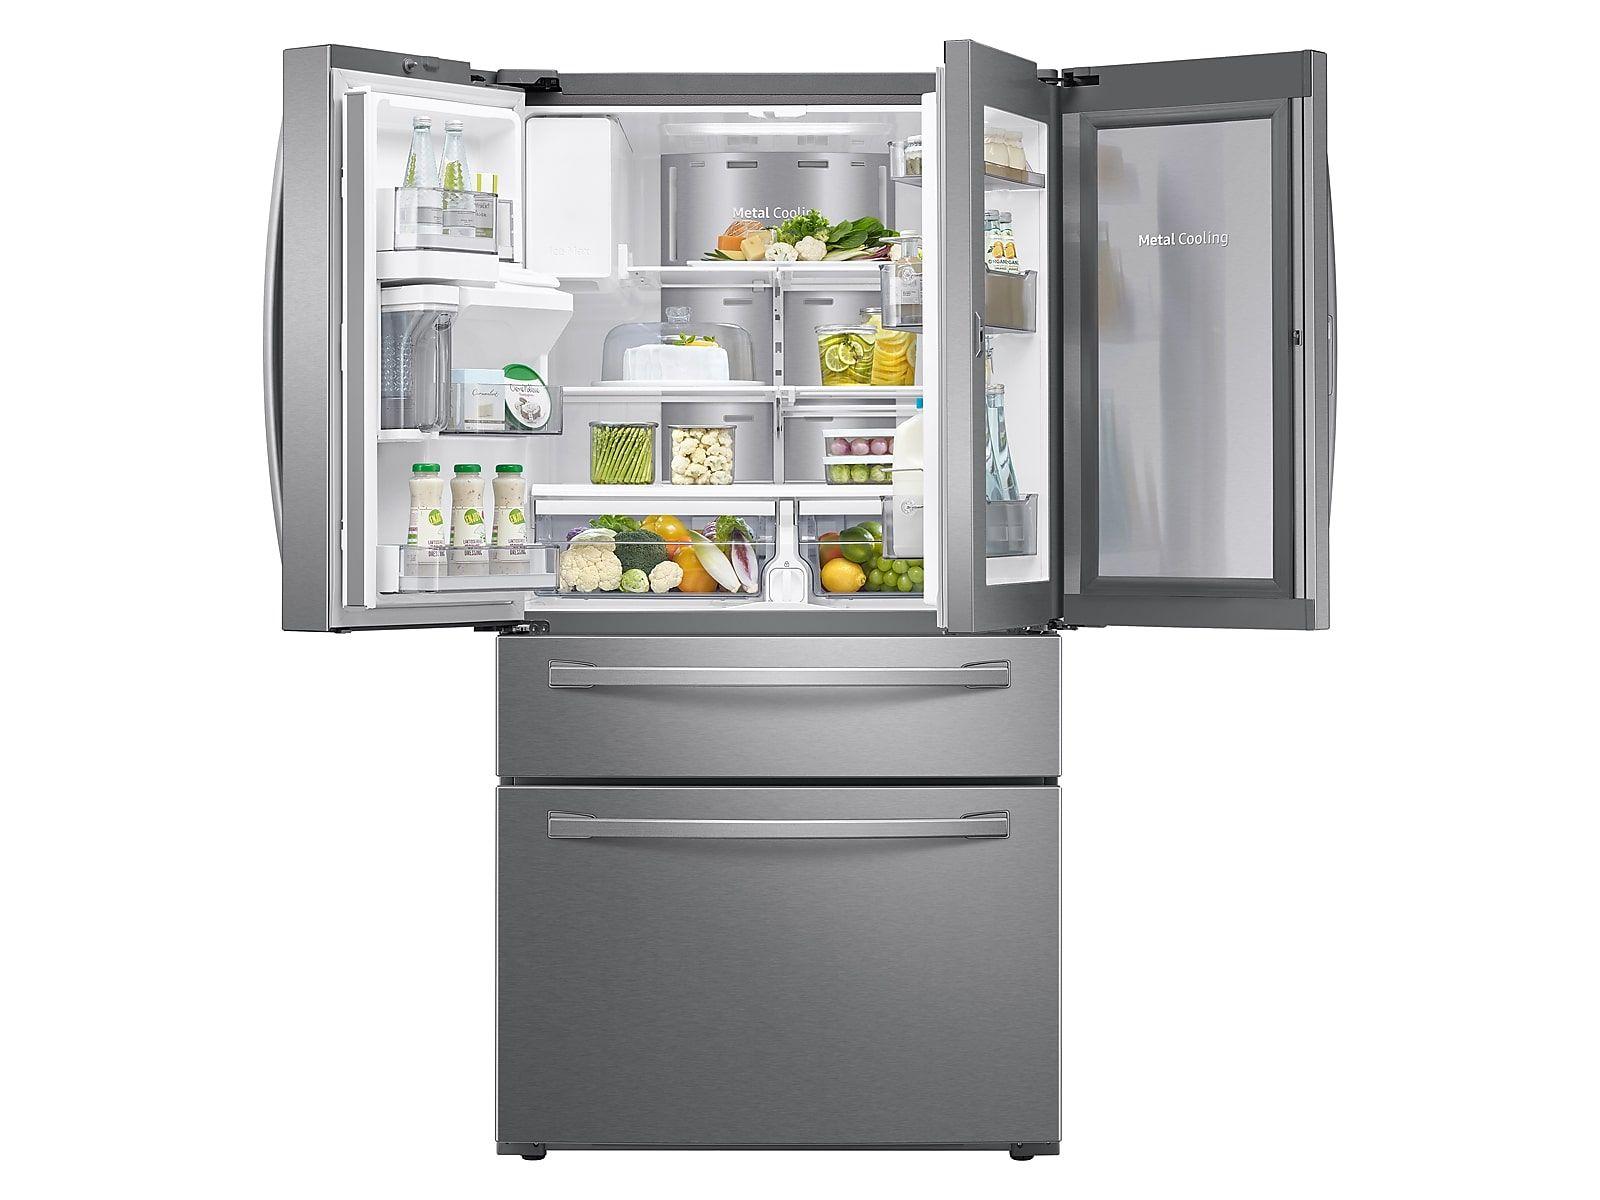 33 Inch Counter Depth Refrigerator Rf18hfenbsr Samsung Us French Door Refrigerator Counter Depth French Door Refrigerator Counter Depth Refrigerator